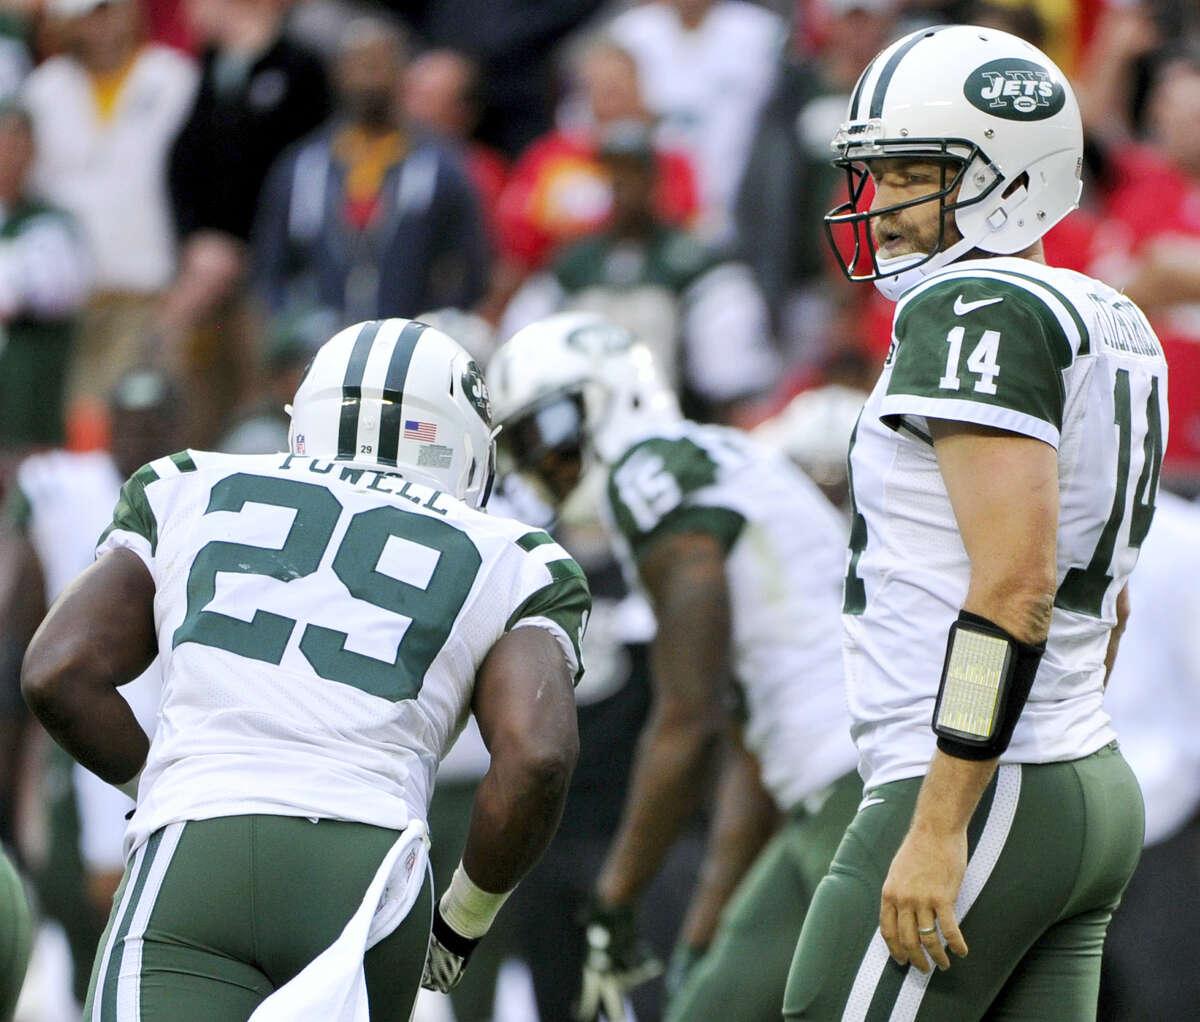 New York Jets quarterback Ryan Fitzpatrick threw six interceptions in a loss to the Chiefs last week.